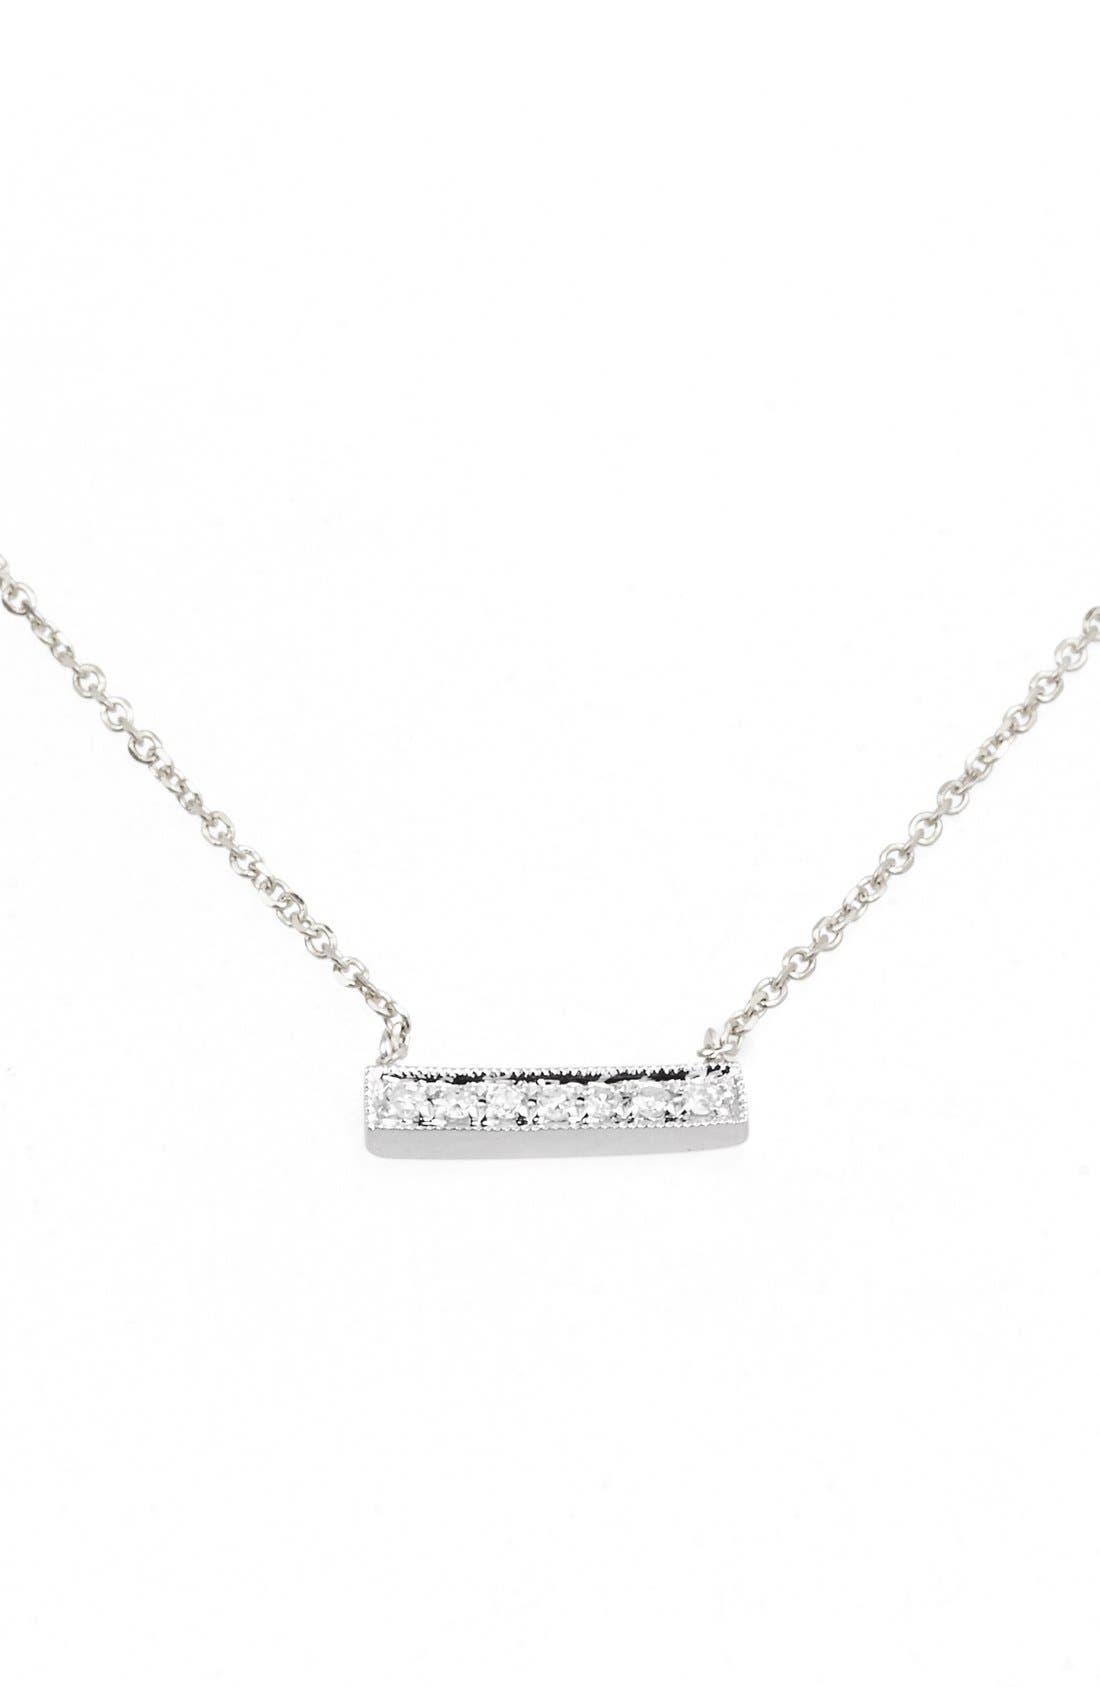 Alternate Image 1 Selected - Dana Rebecca Designs 'Sylvie Rose' Diamond Bar Pendant Necklace